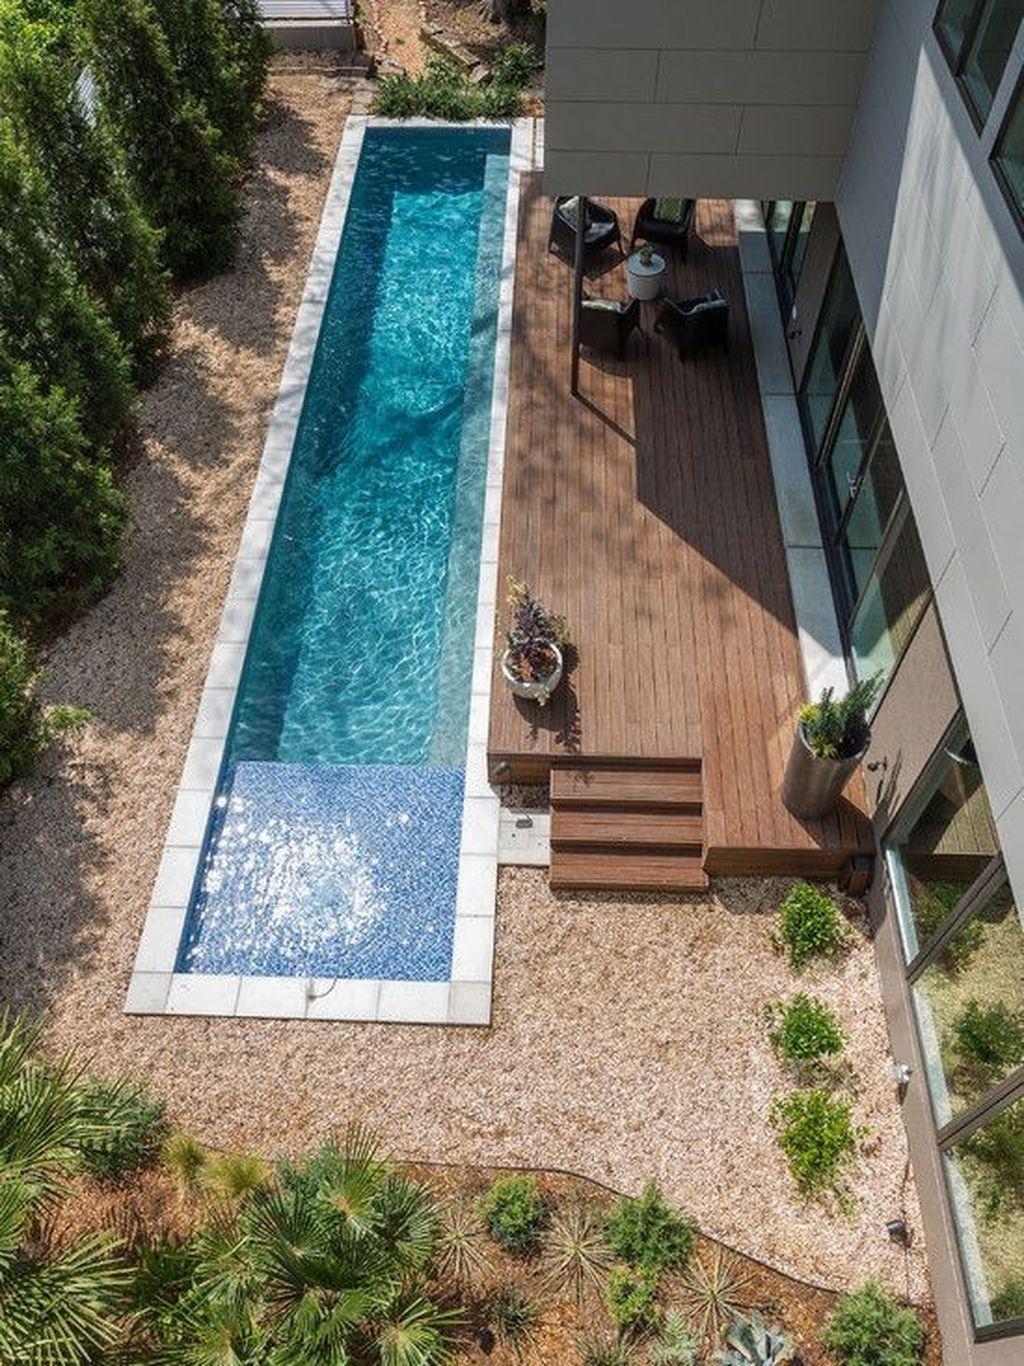 Pin by elizabeth russo on pools in pinterest backyard pool